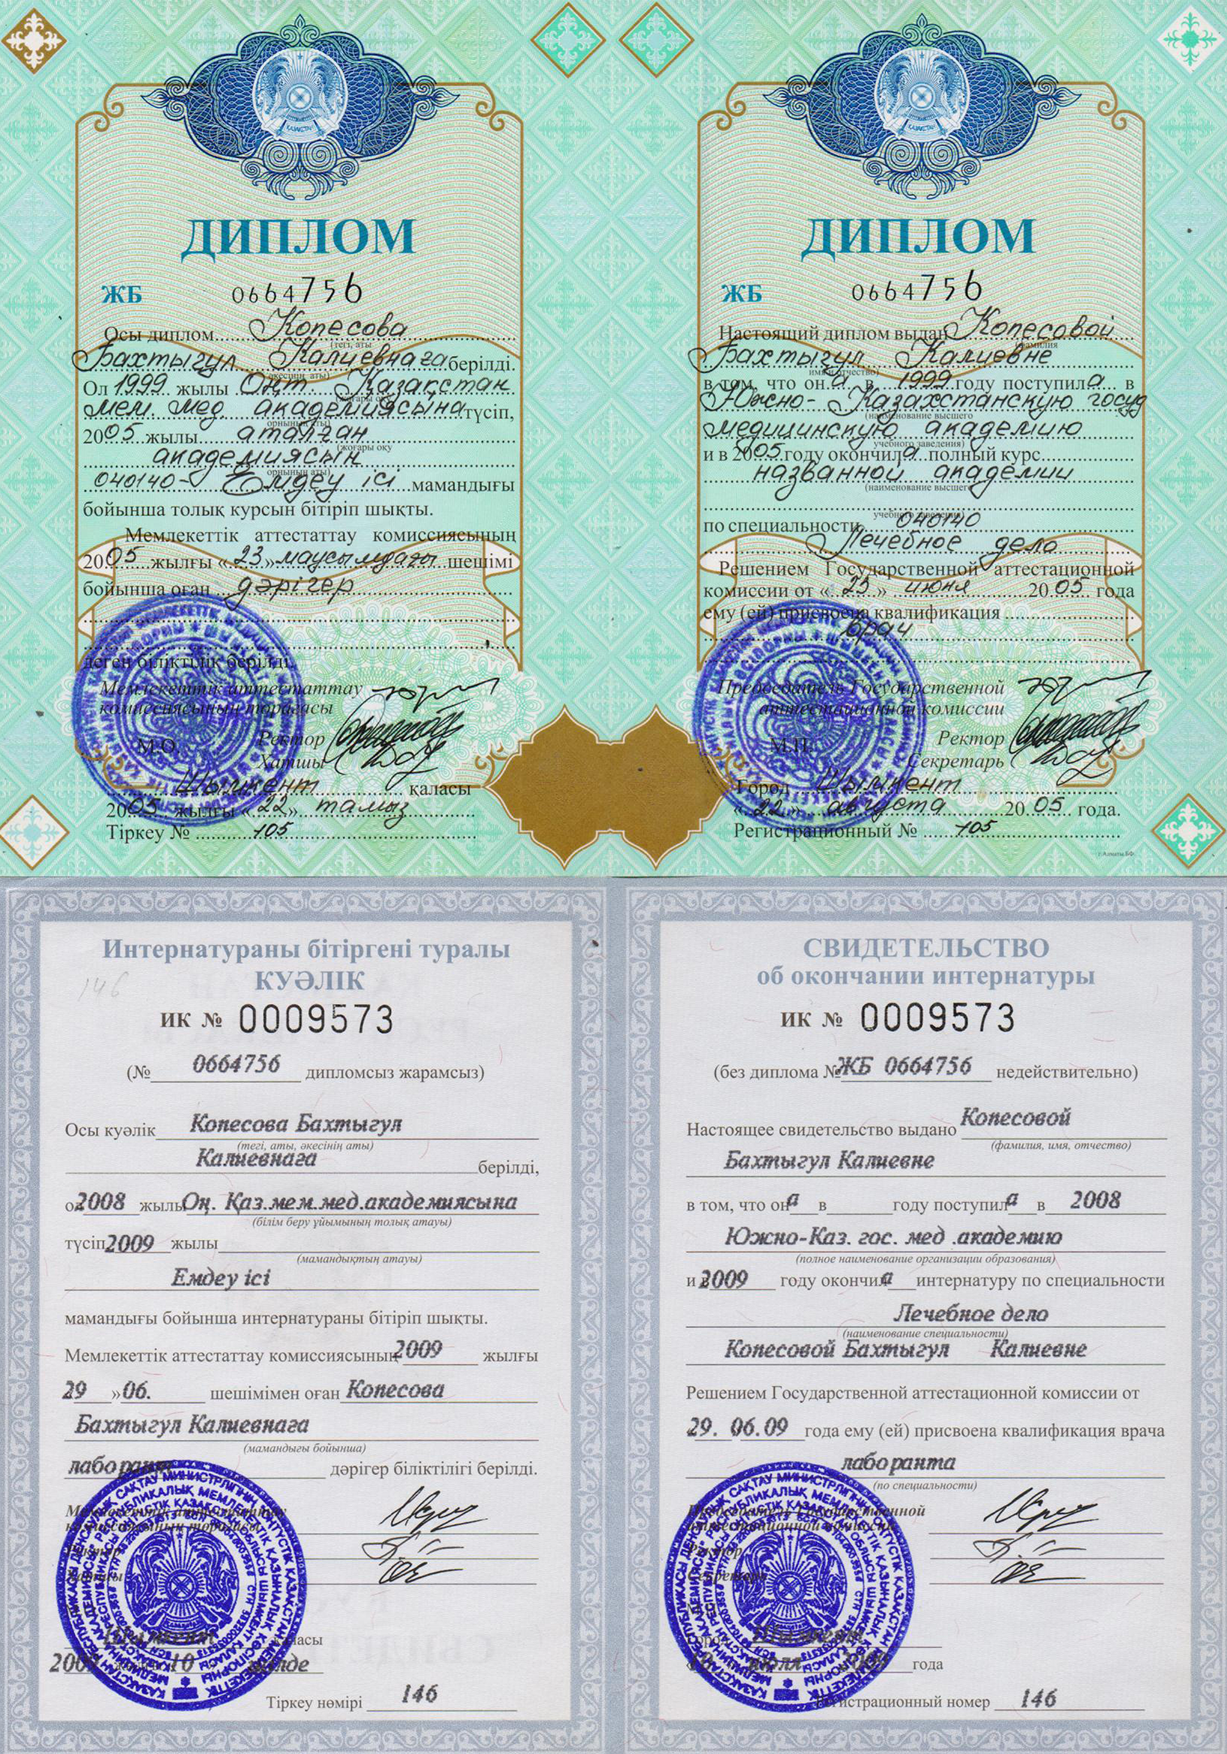 Диплом Лаборанта интернатура клиники Akniet Shipa сайрамский р-н. с. Карабулак